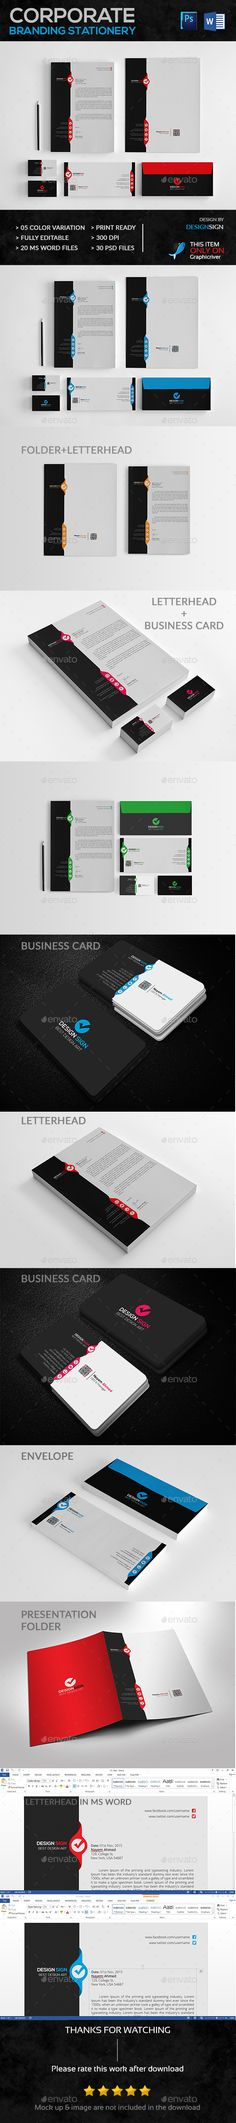 Corporate Branding Stationery Vol. 01 - Stationery Print Templates